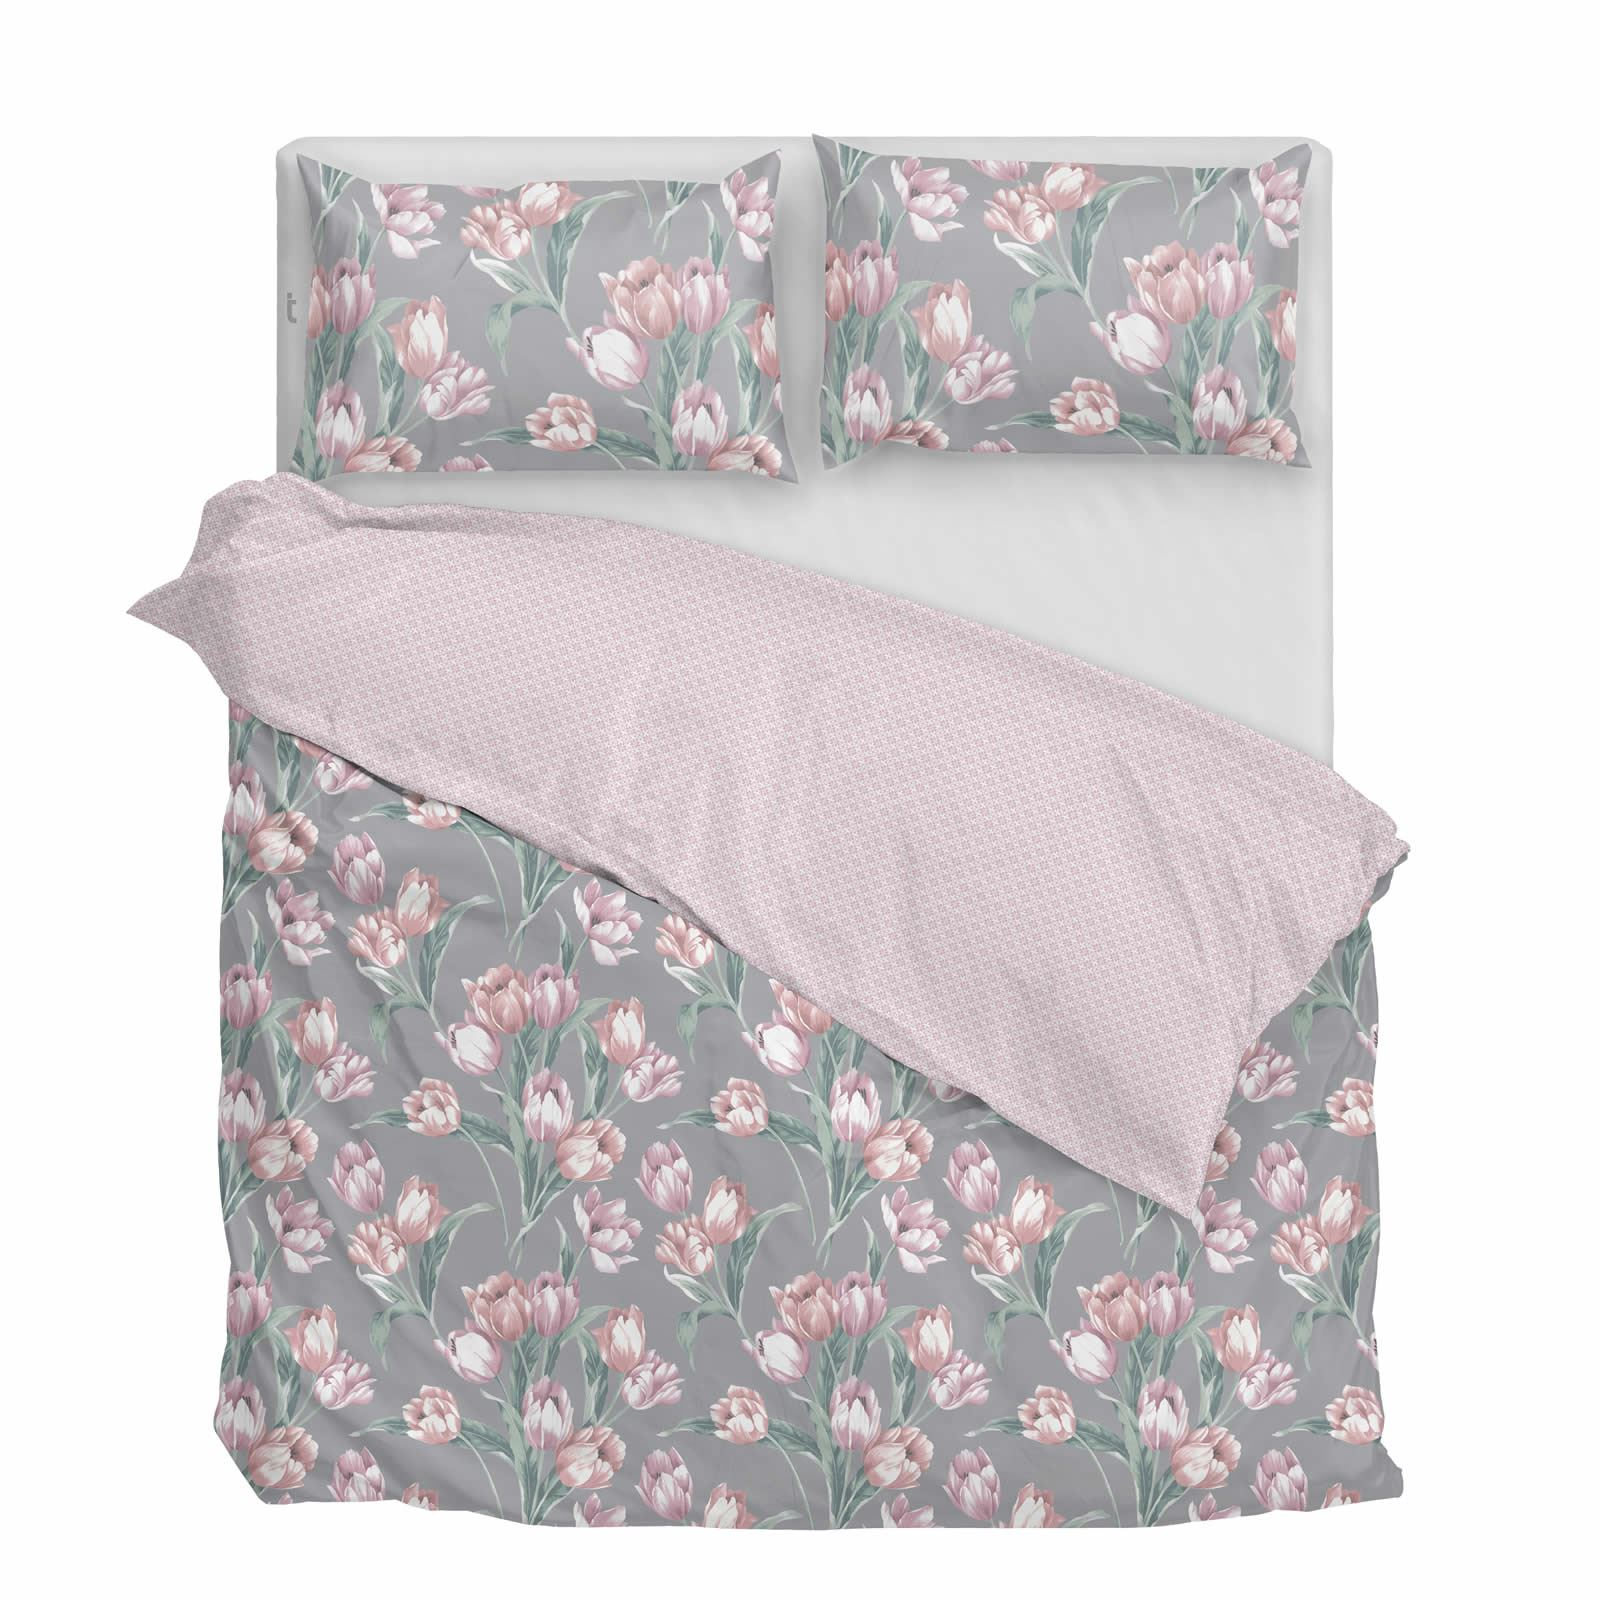 Cubierta-Edredon-Rosa-Blush-Rose-Impreso-juego-De-Edredon-Conjuntos-de-Cama-cubre-Jacquard miniatura 50